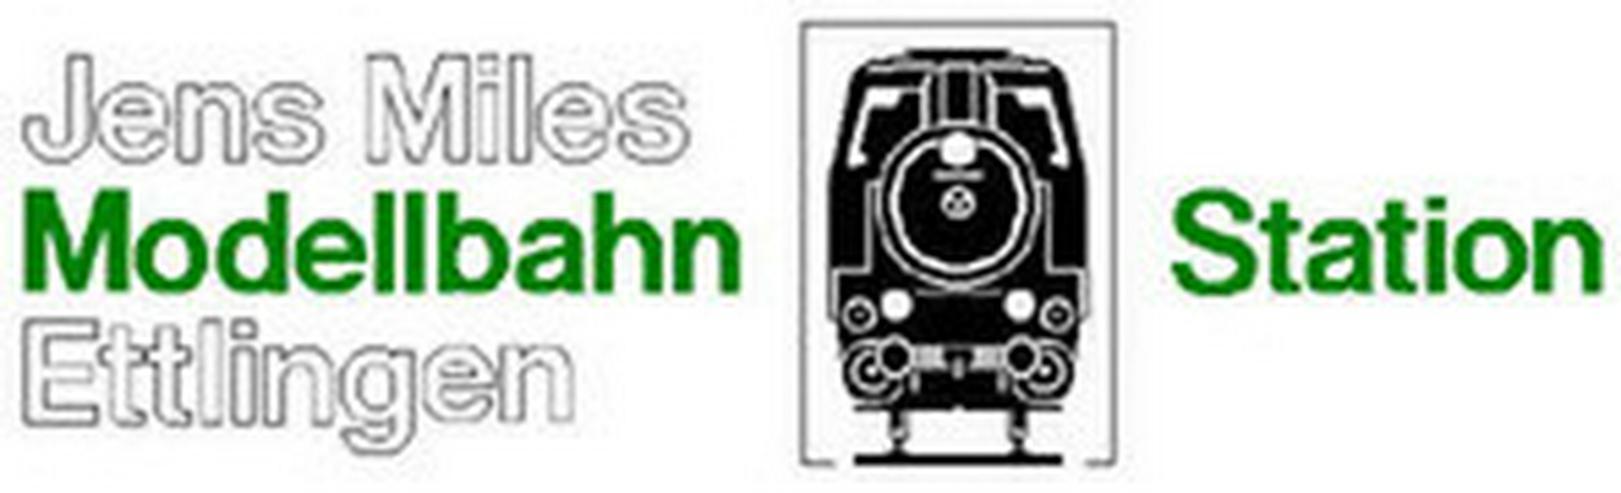 https://www.modellbahn-station-ettlingen.com - Zubehör & Ersatzteile - Bild 1